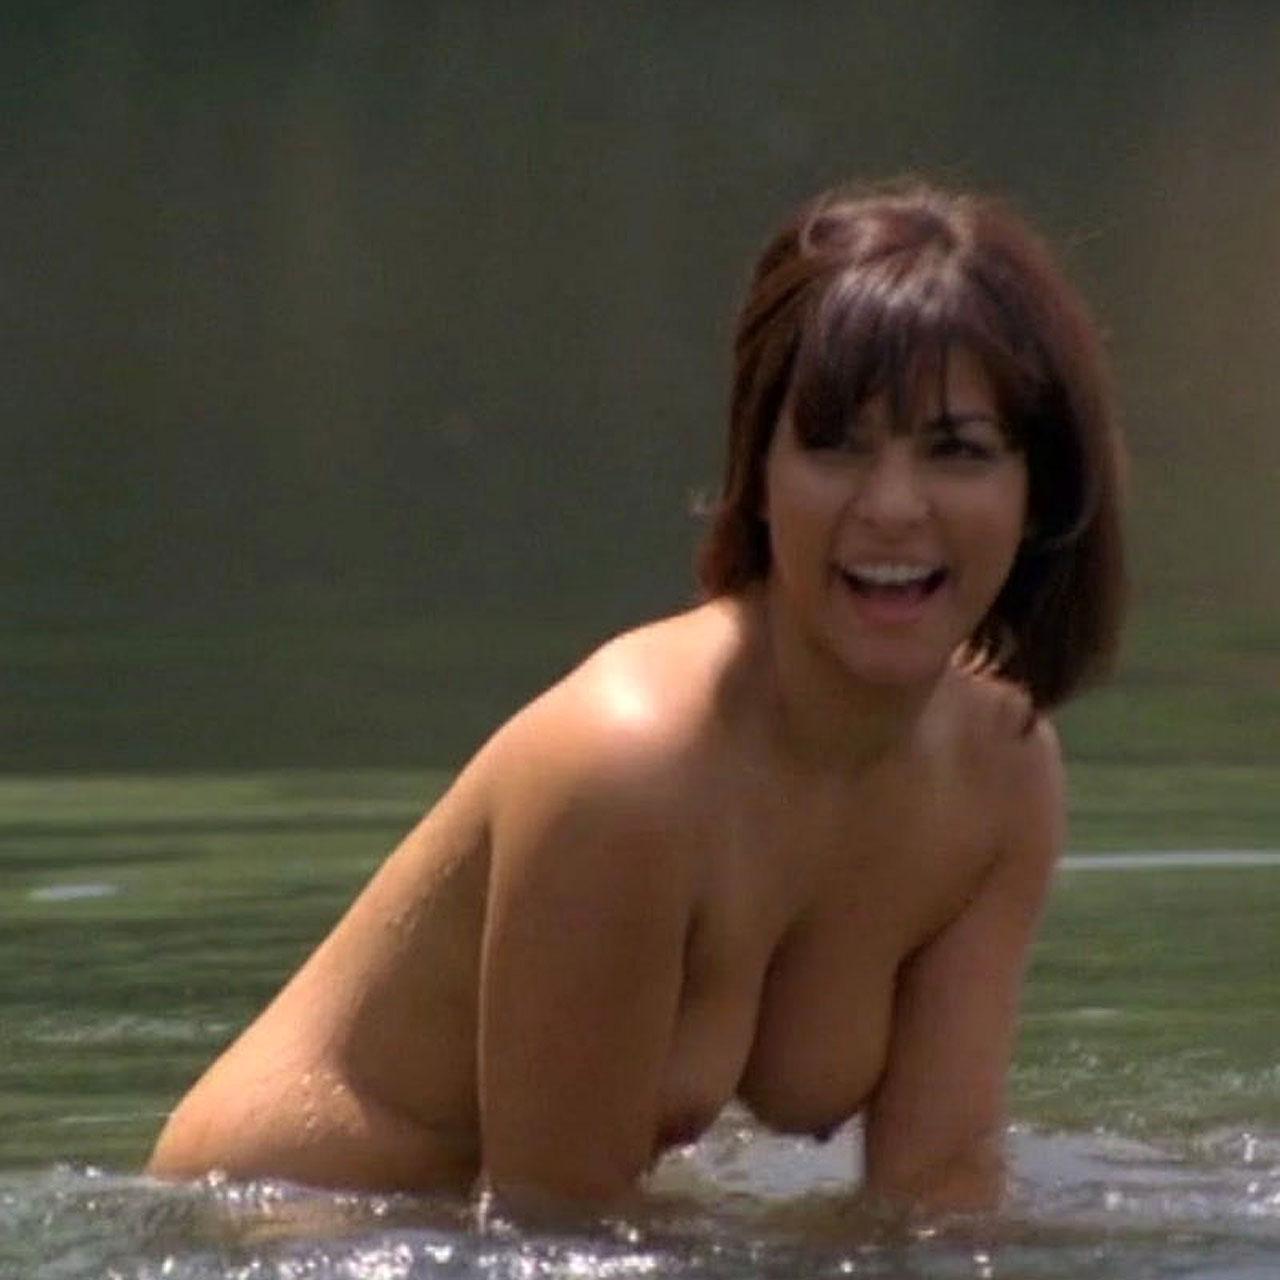 Roxanne Pallett Nude Pics & Videos, Sex